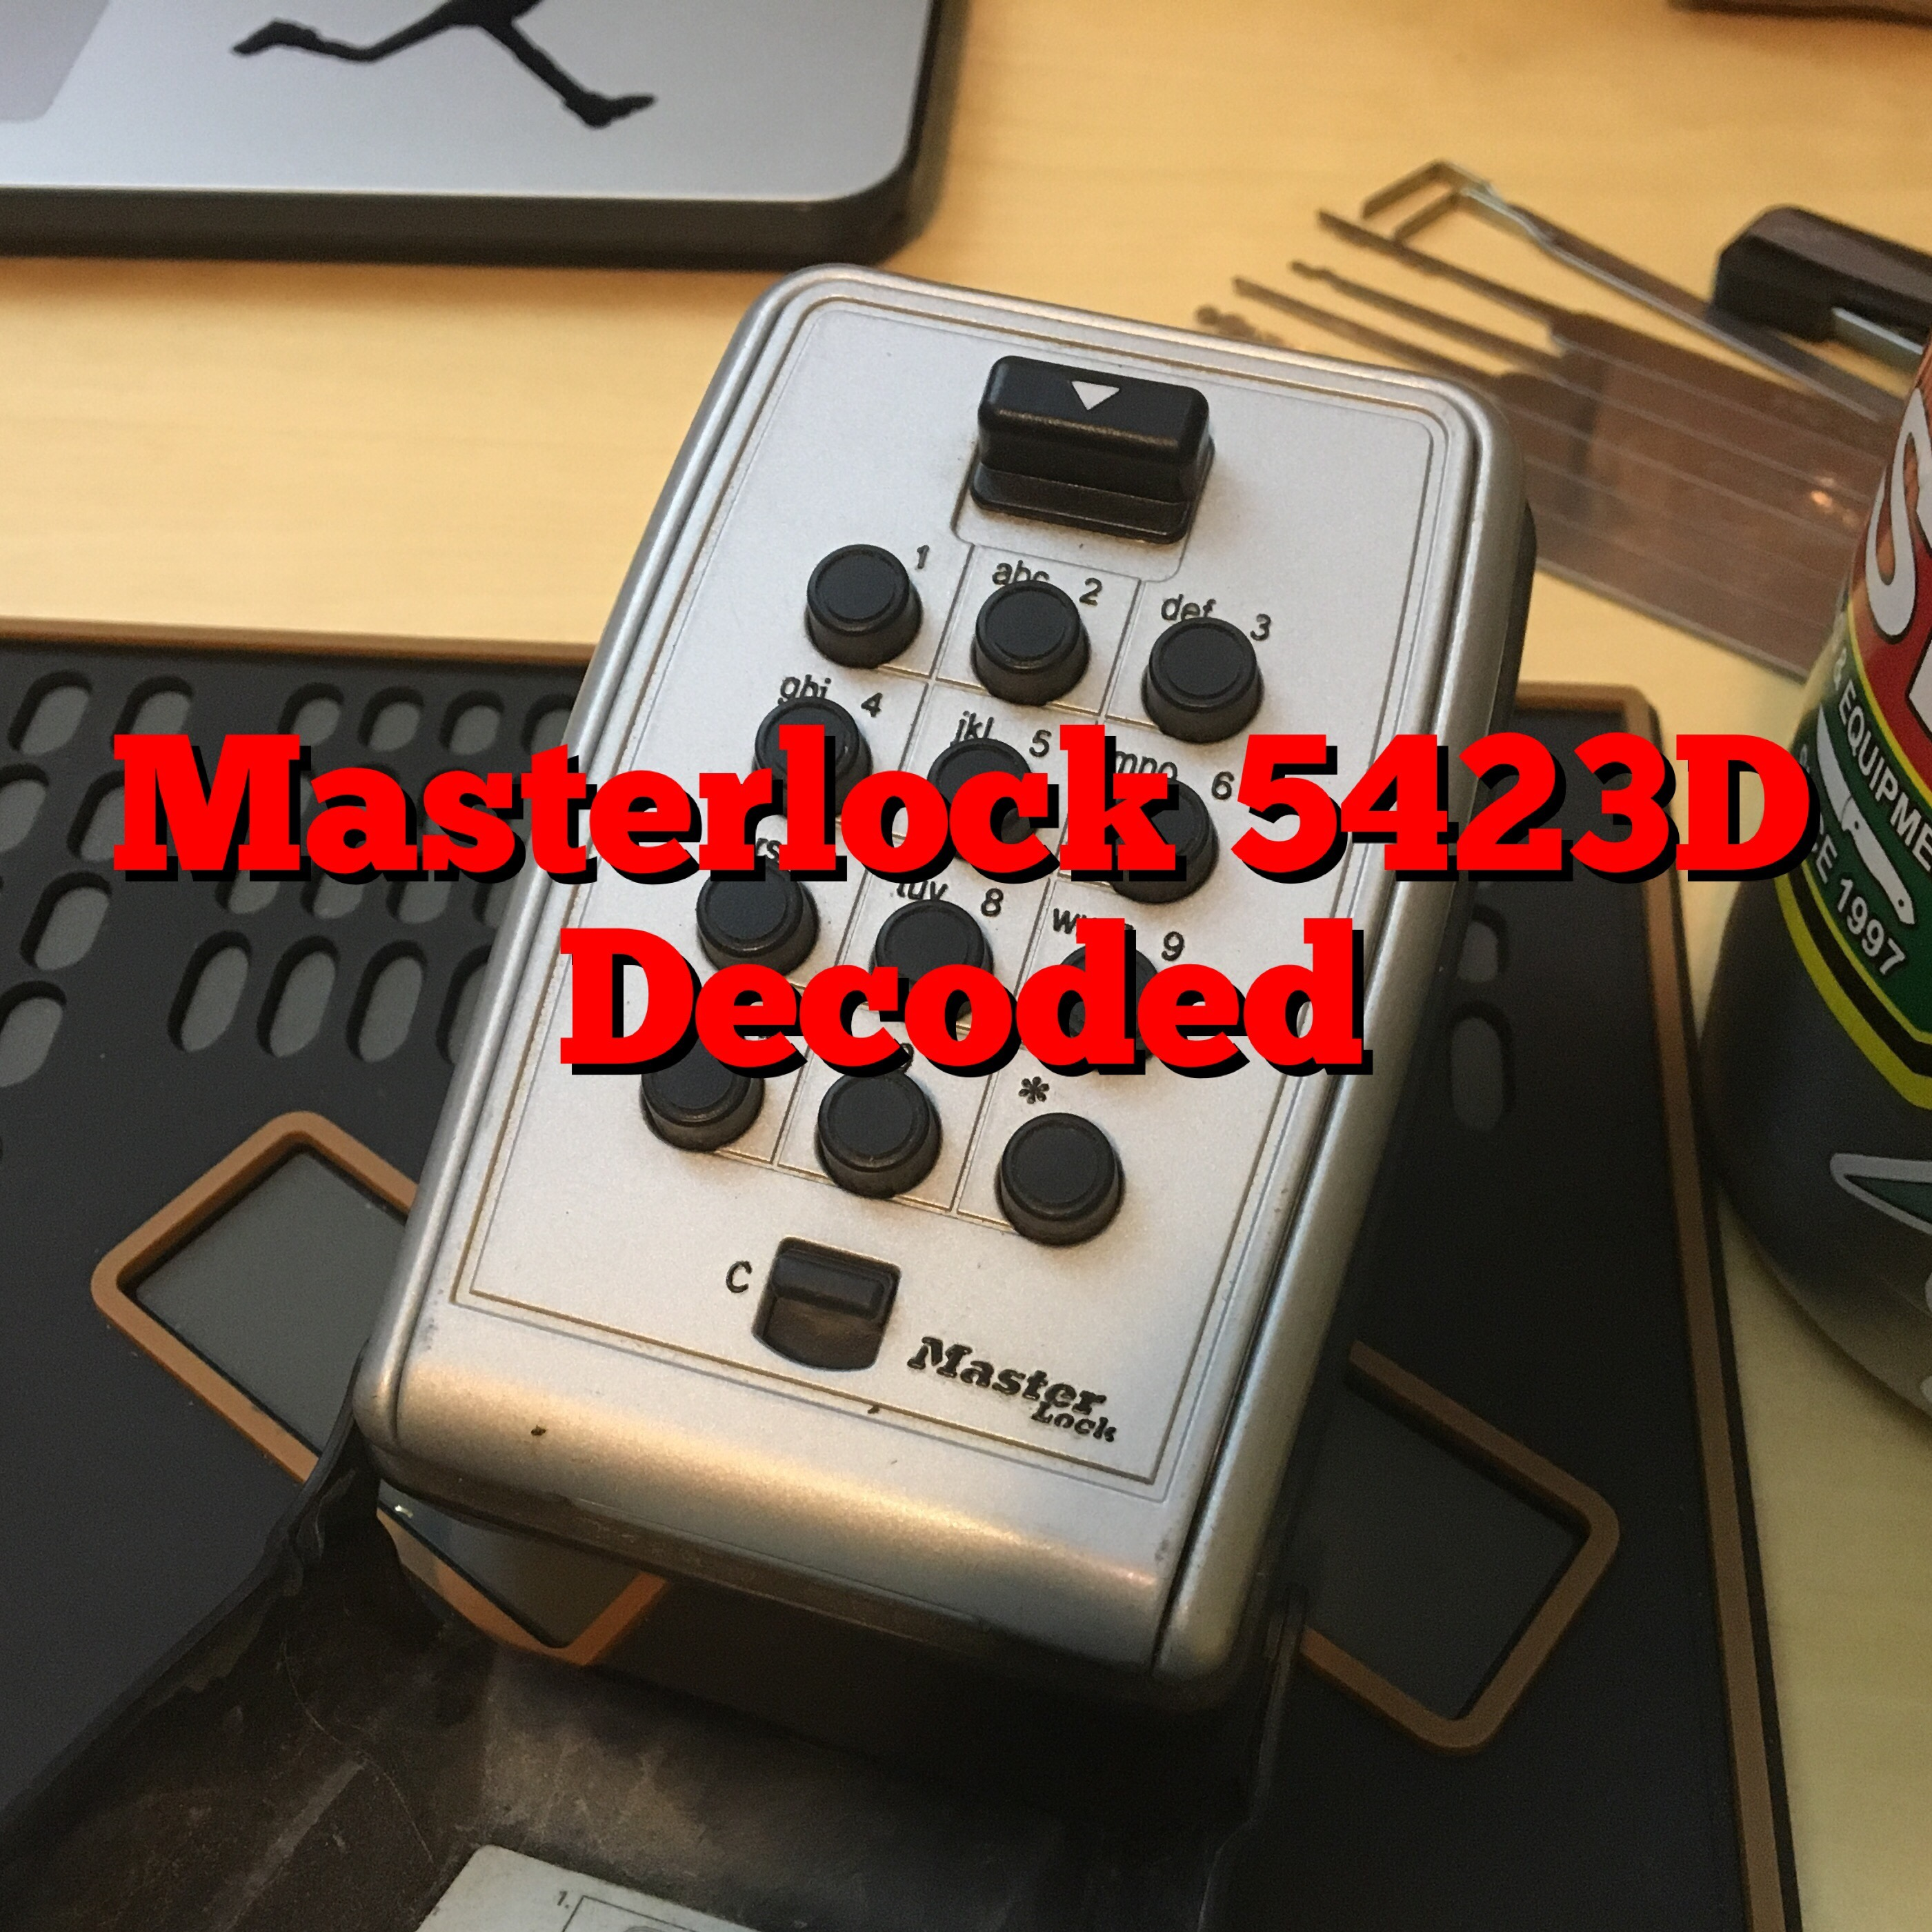 Master Lock 5423D